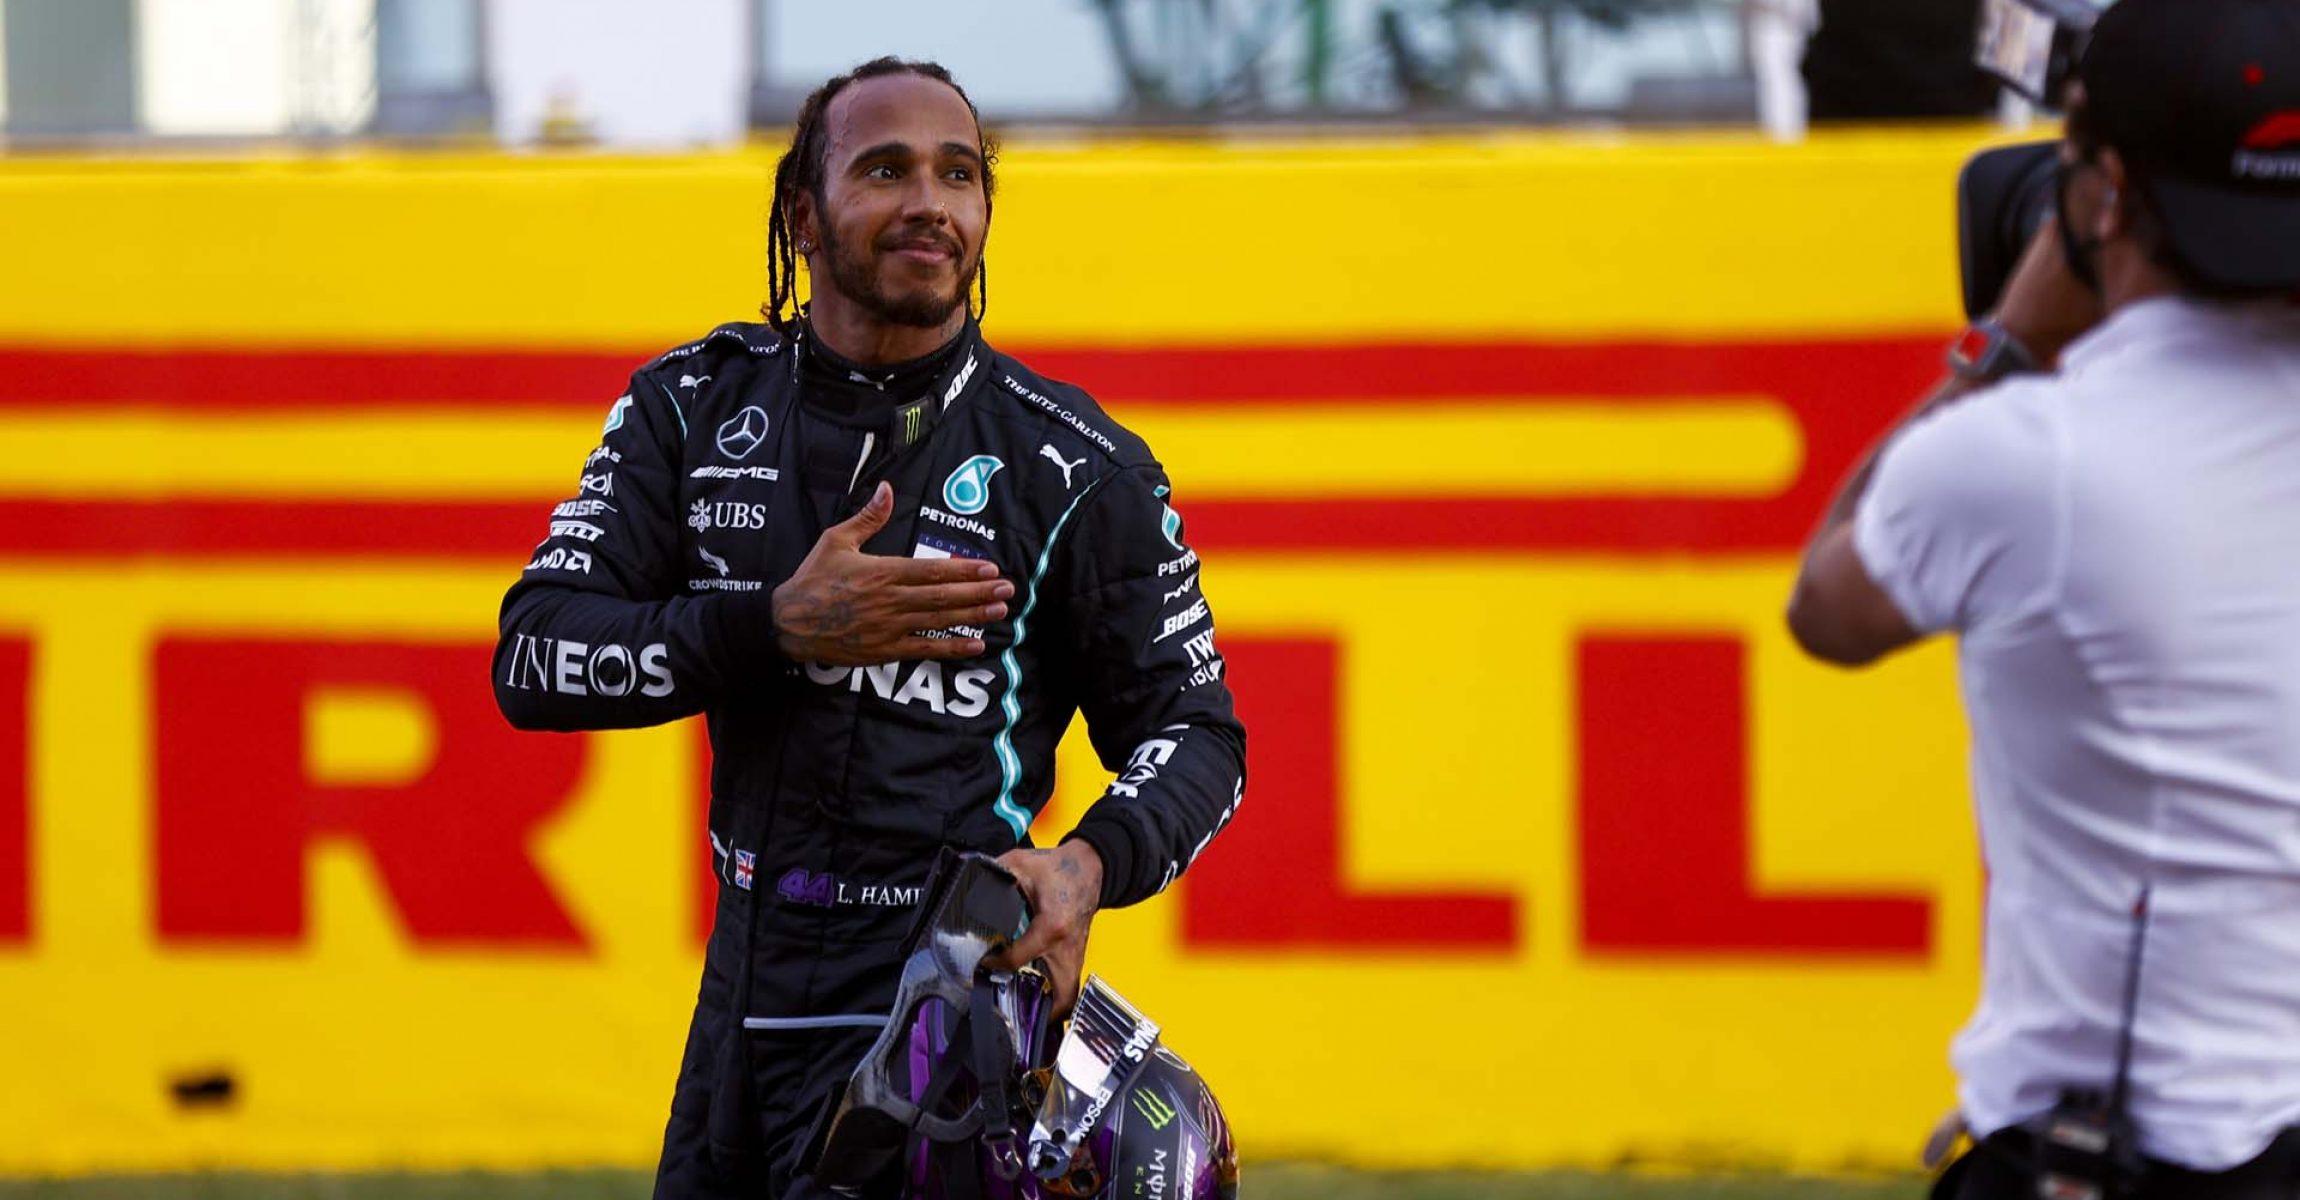 2020 Tuscan Grand Prix, Sunday - LAT Images Lewis Hamilton Mercedes